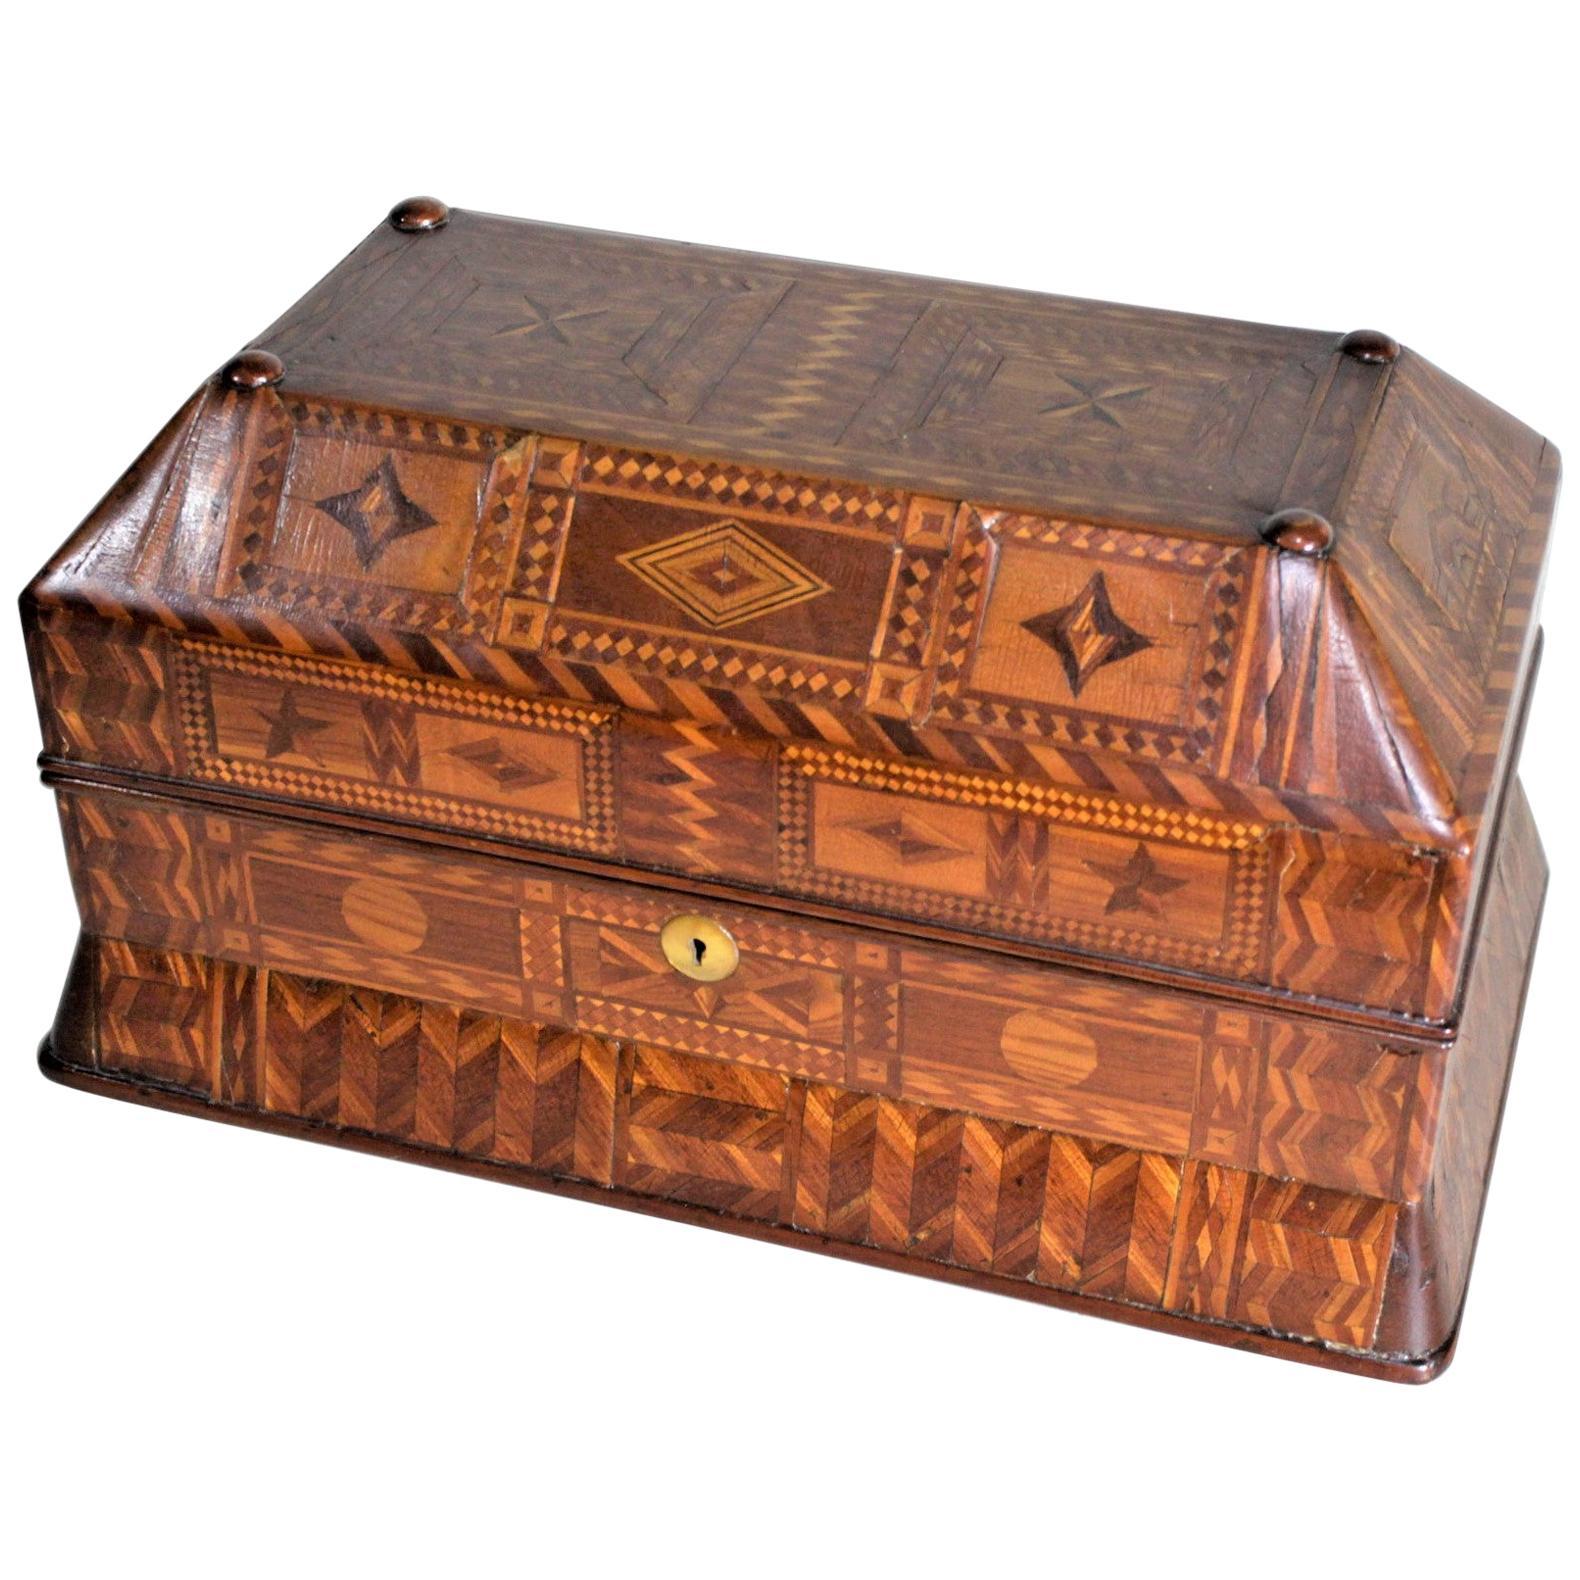 Superb Antique Folk Art Parquetry Casket Styled Writing Box or Lap Desk